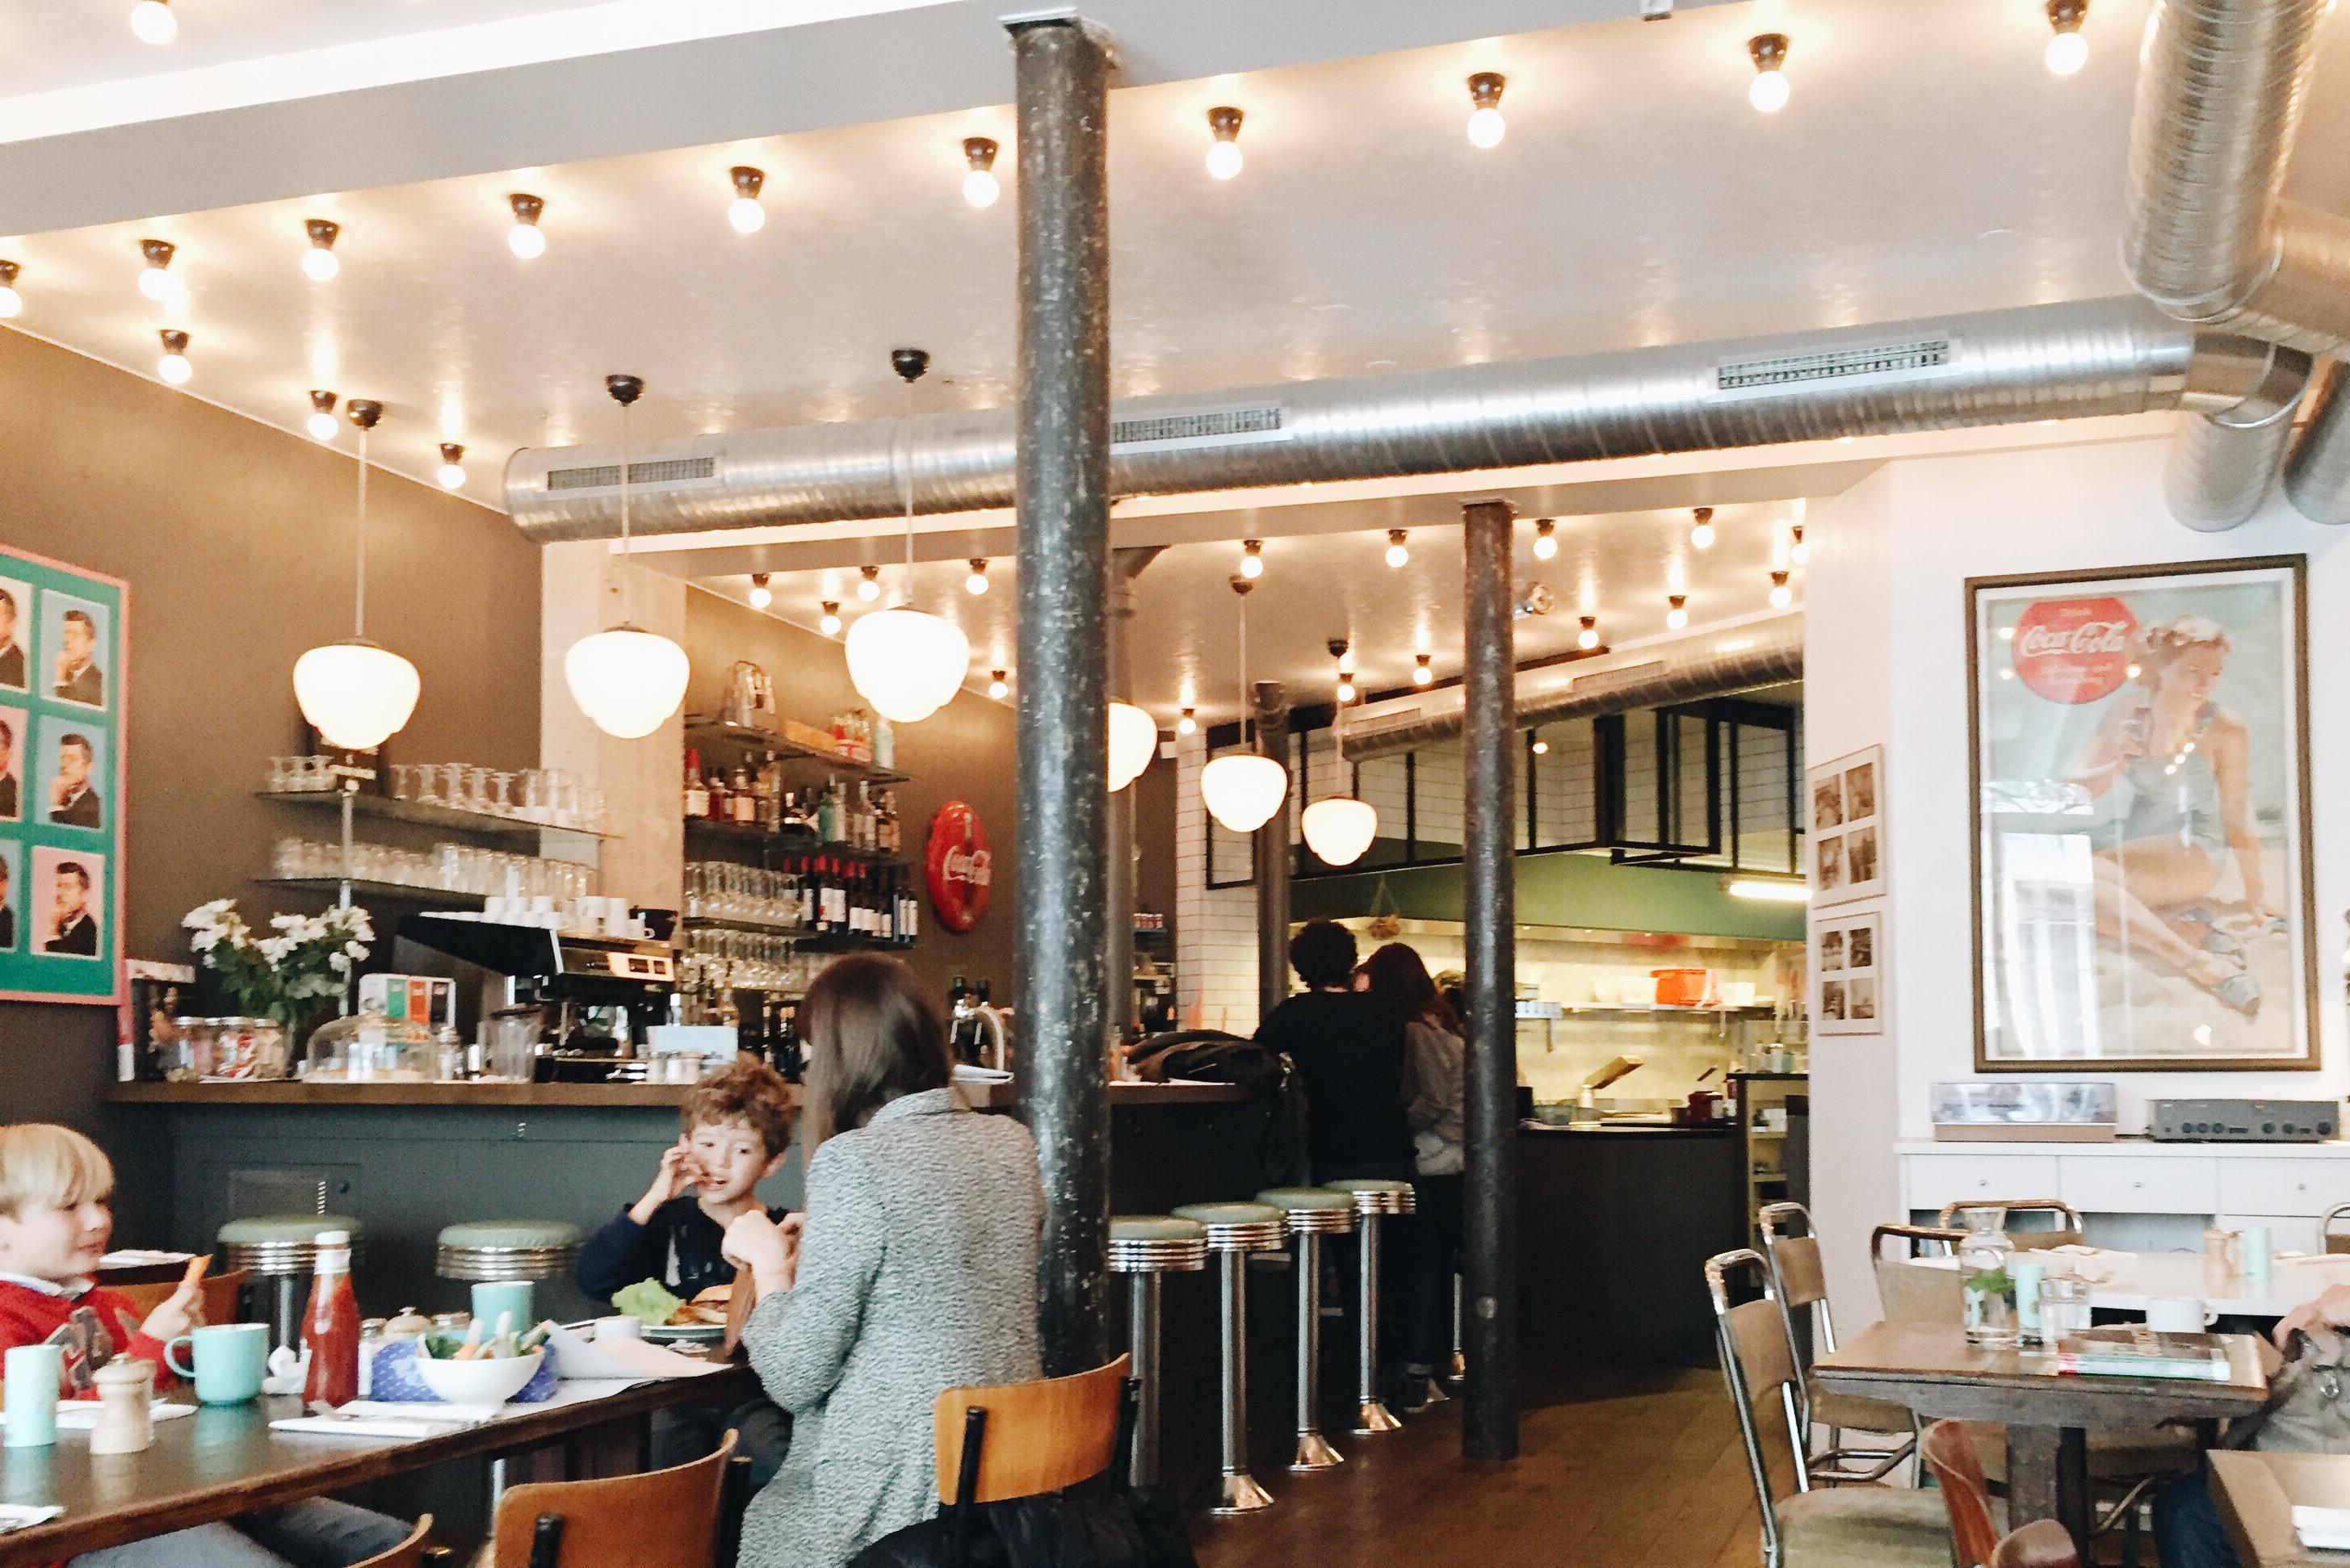 Coffee Club, Sweet Cabane